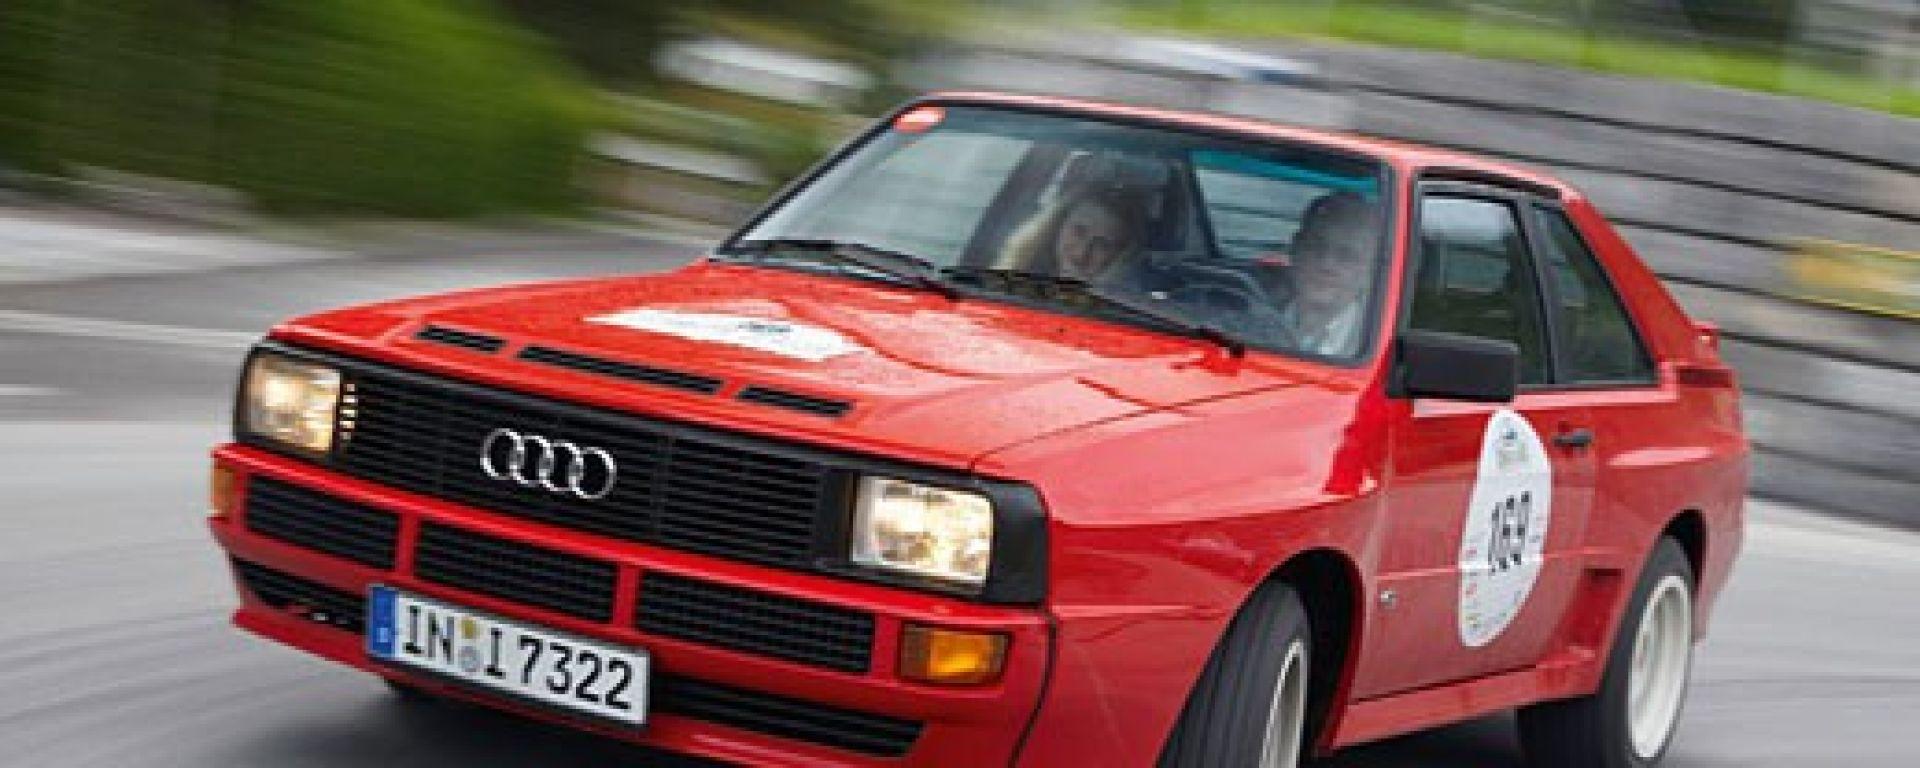 Audi Sport Quattro: rinnegata dal padre